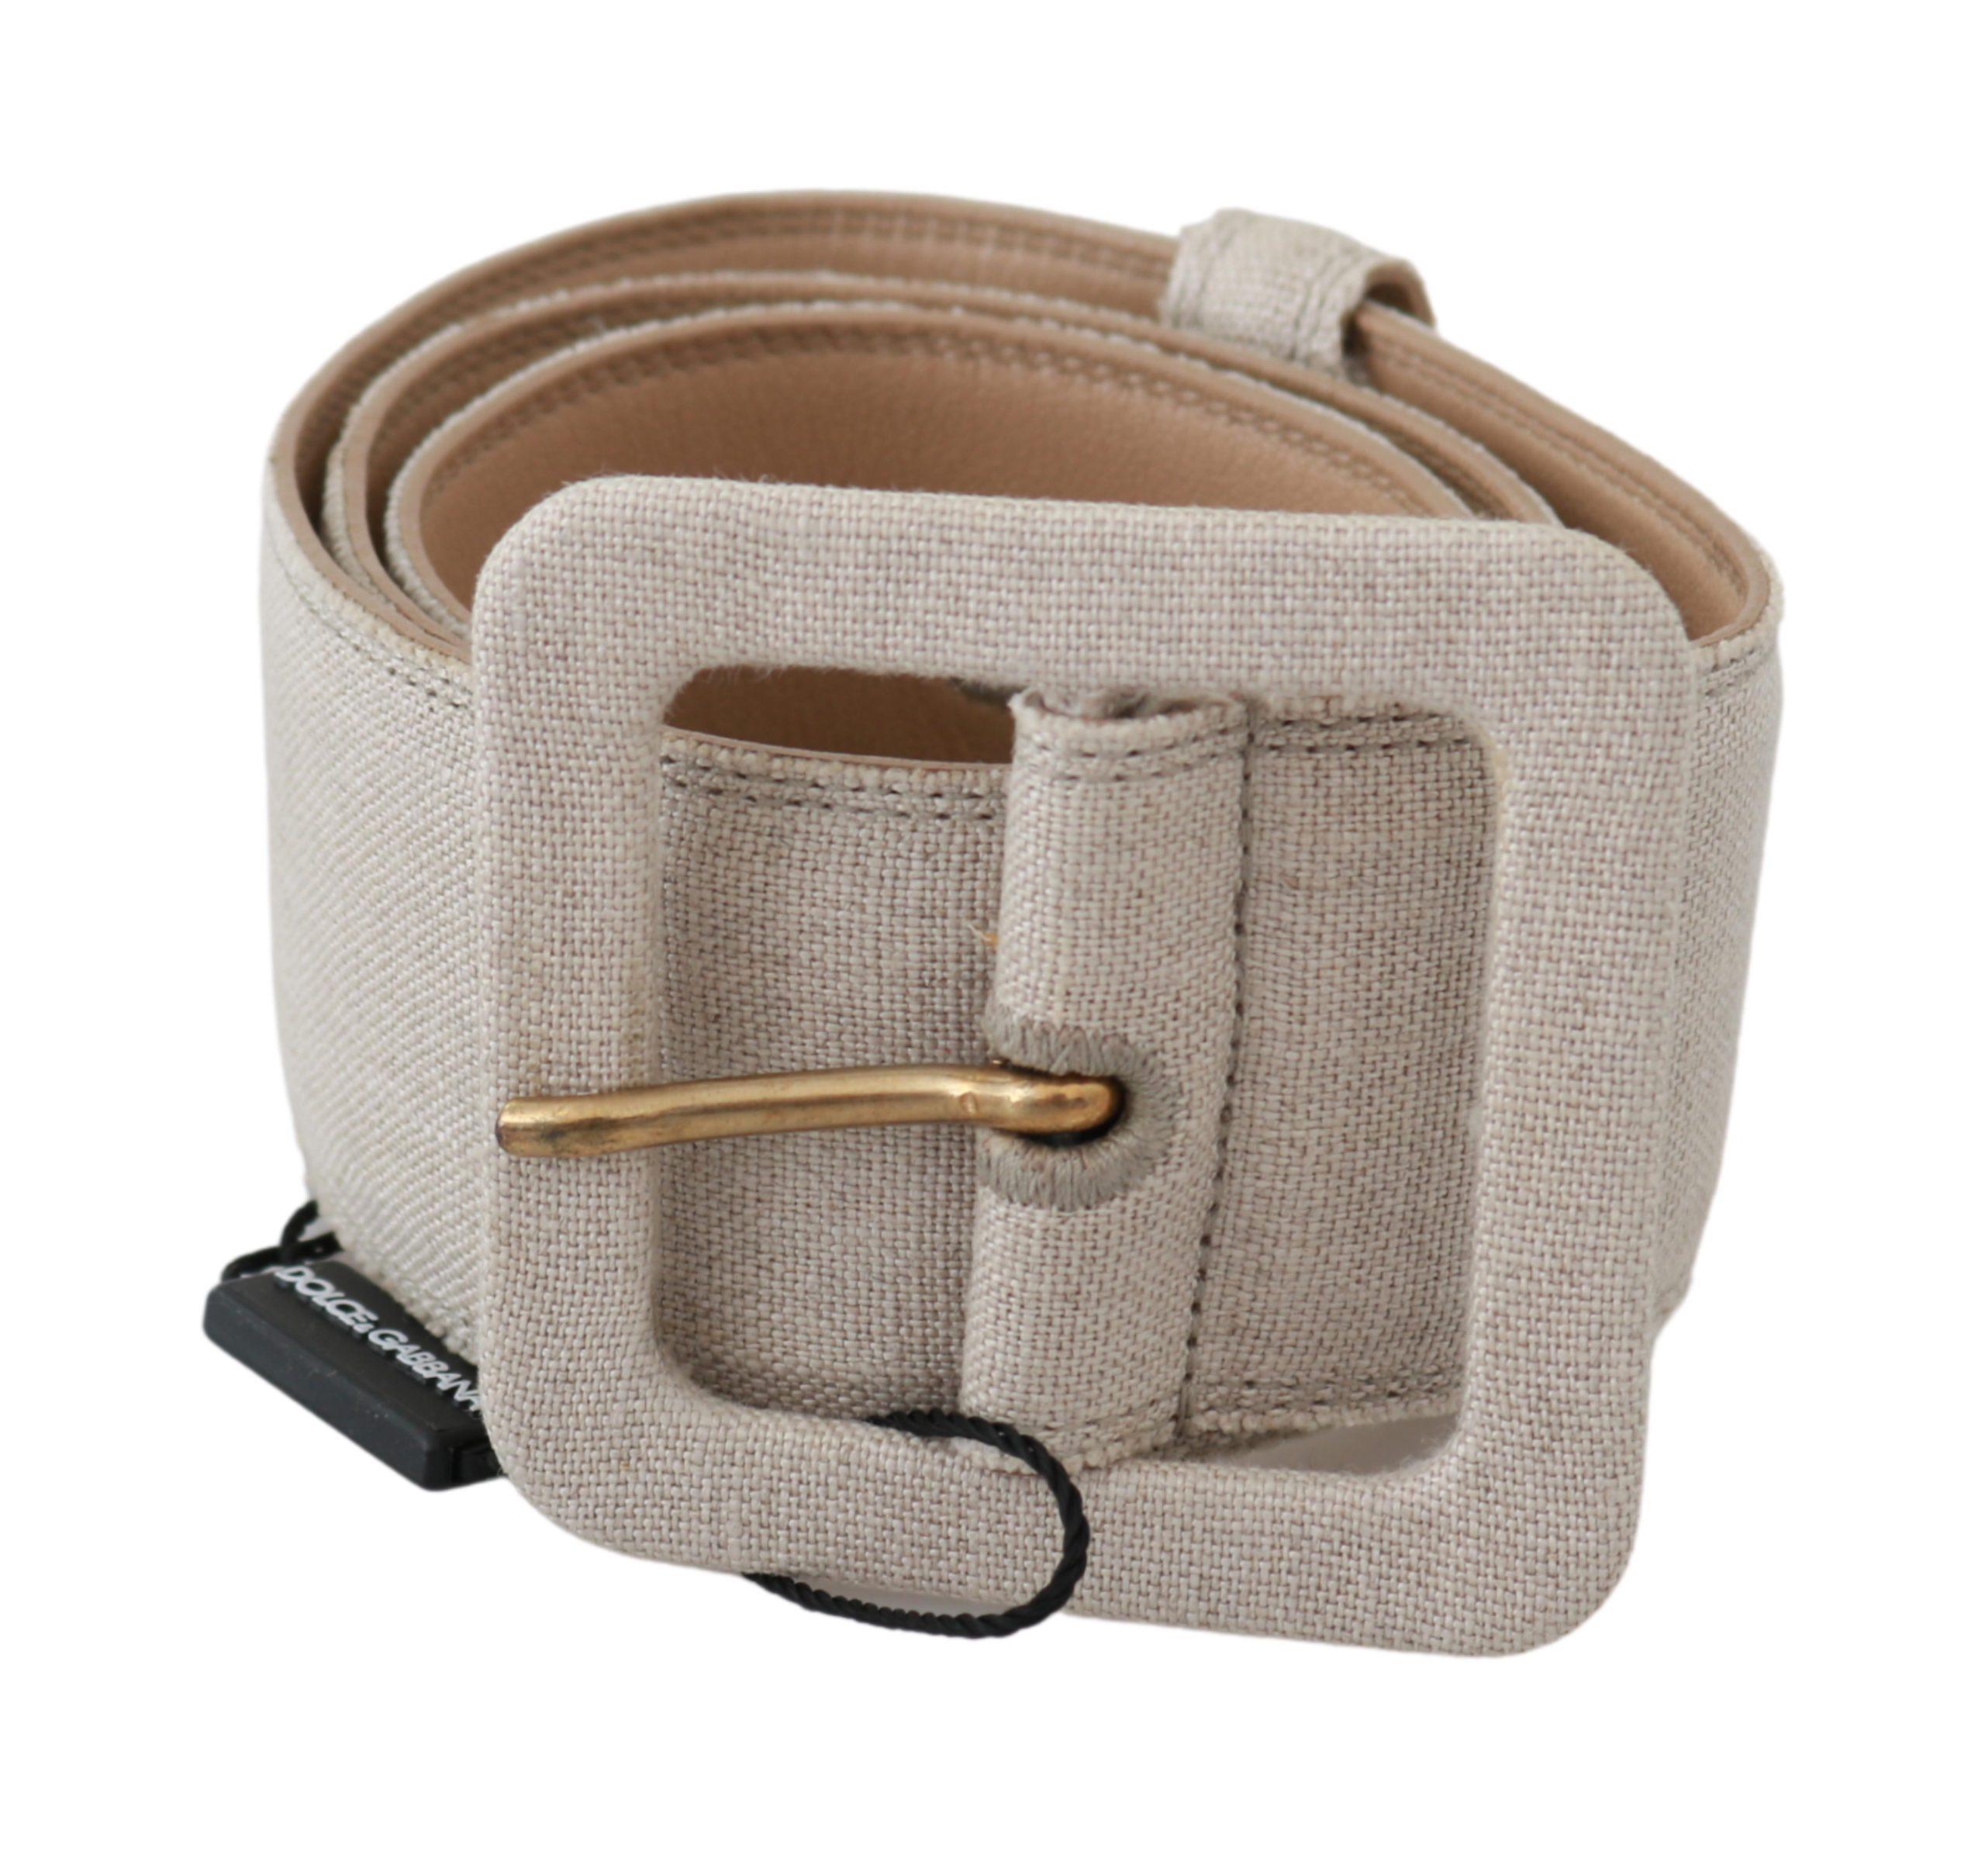 Dolce & Gabbana Women's Square Buckle Waist Linen Belt Beige BEL60553 - 70 cm / 28 Inches